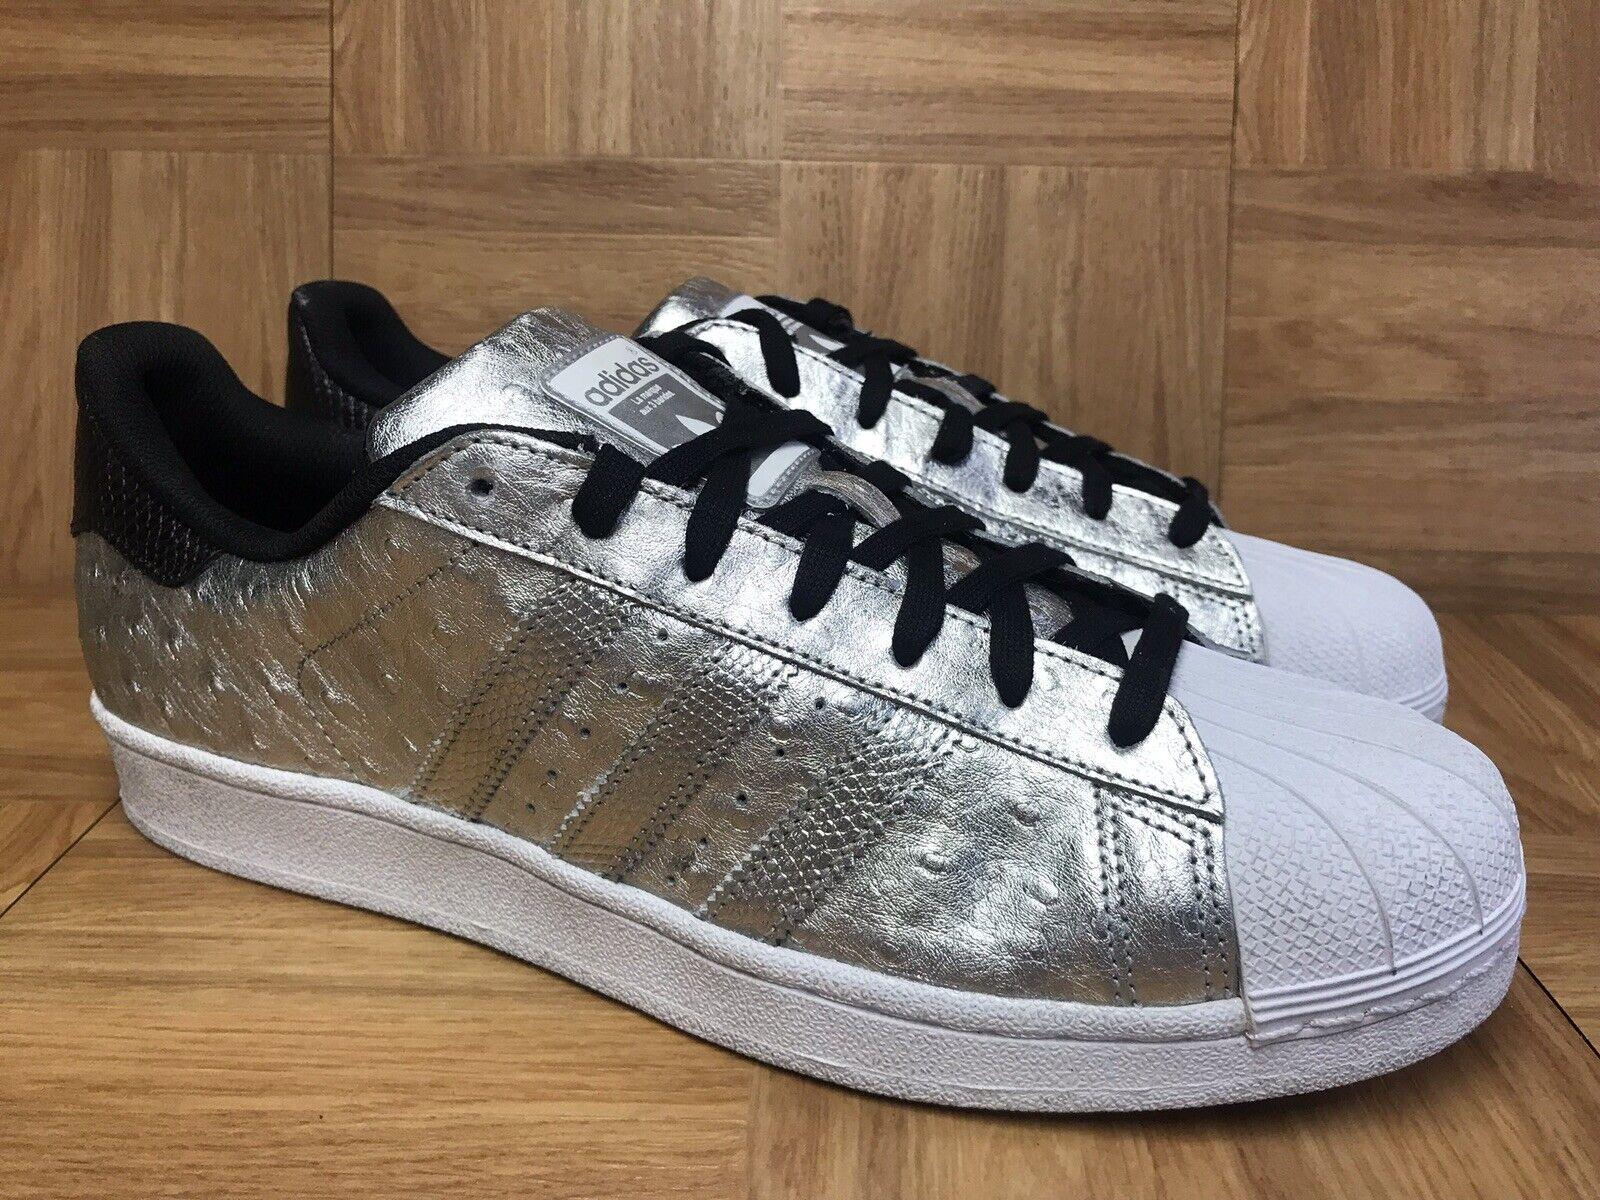 RARE Adidas Originals Superstar Metallic Silver Foil Ostrich Sz 11 Men's shoes